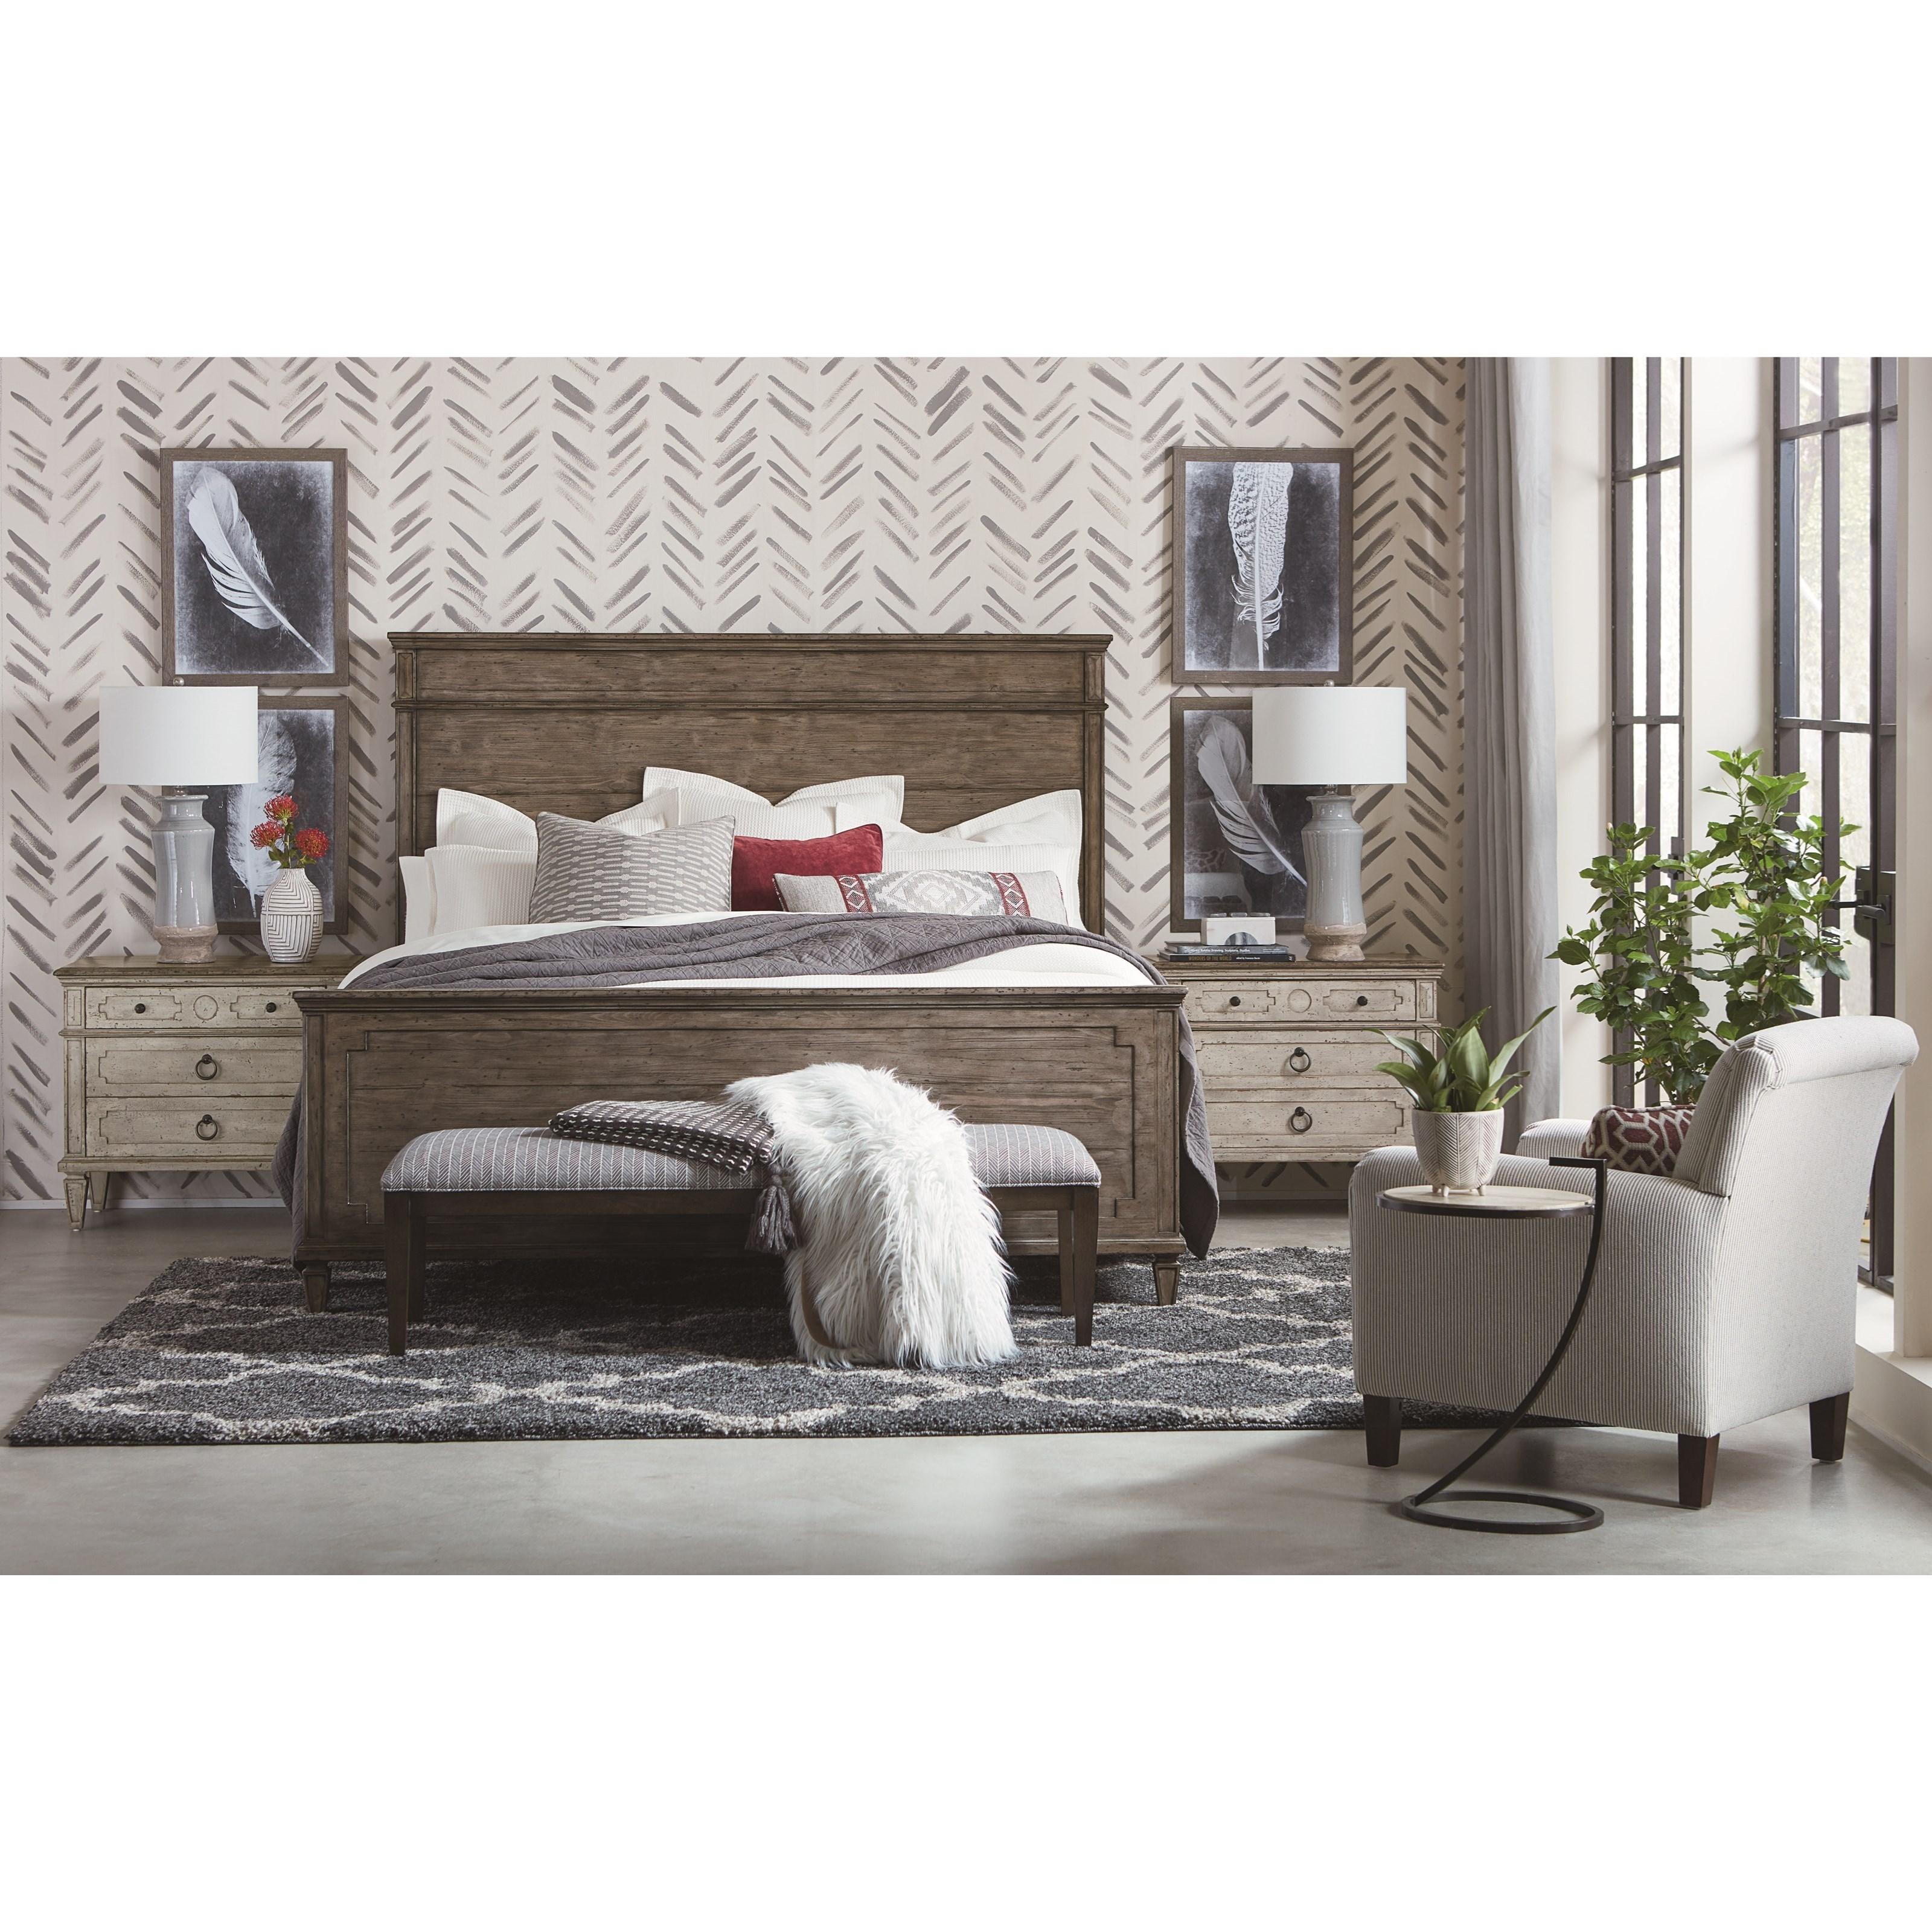 Bassett Furniture San Antonio Tx: Rustic King Panel Headboard